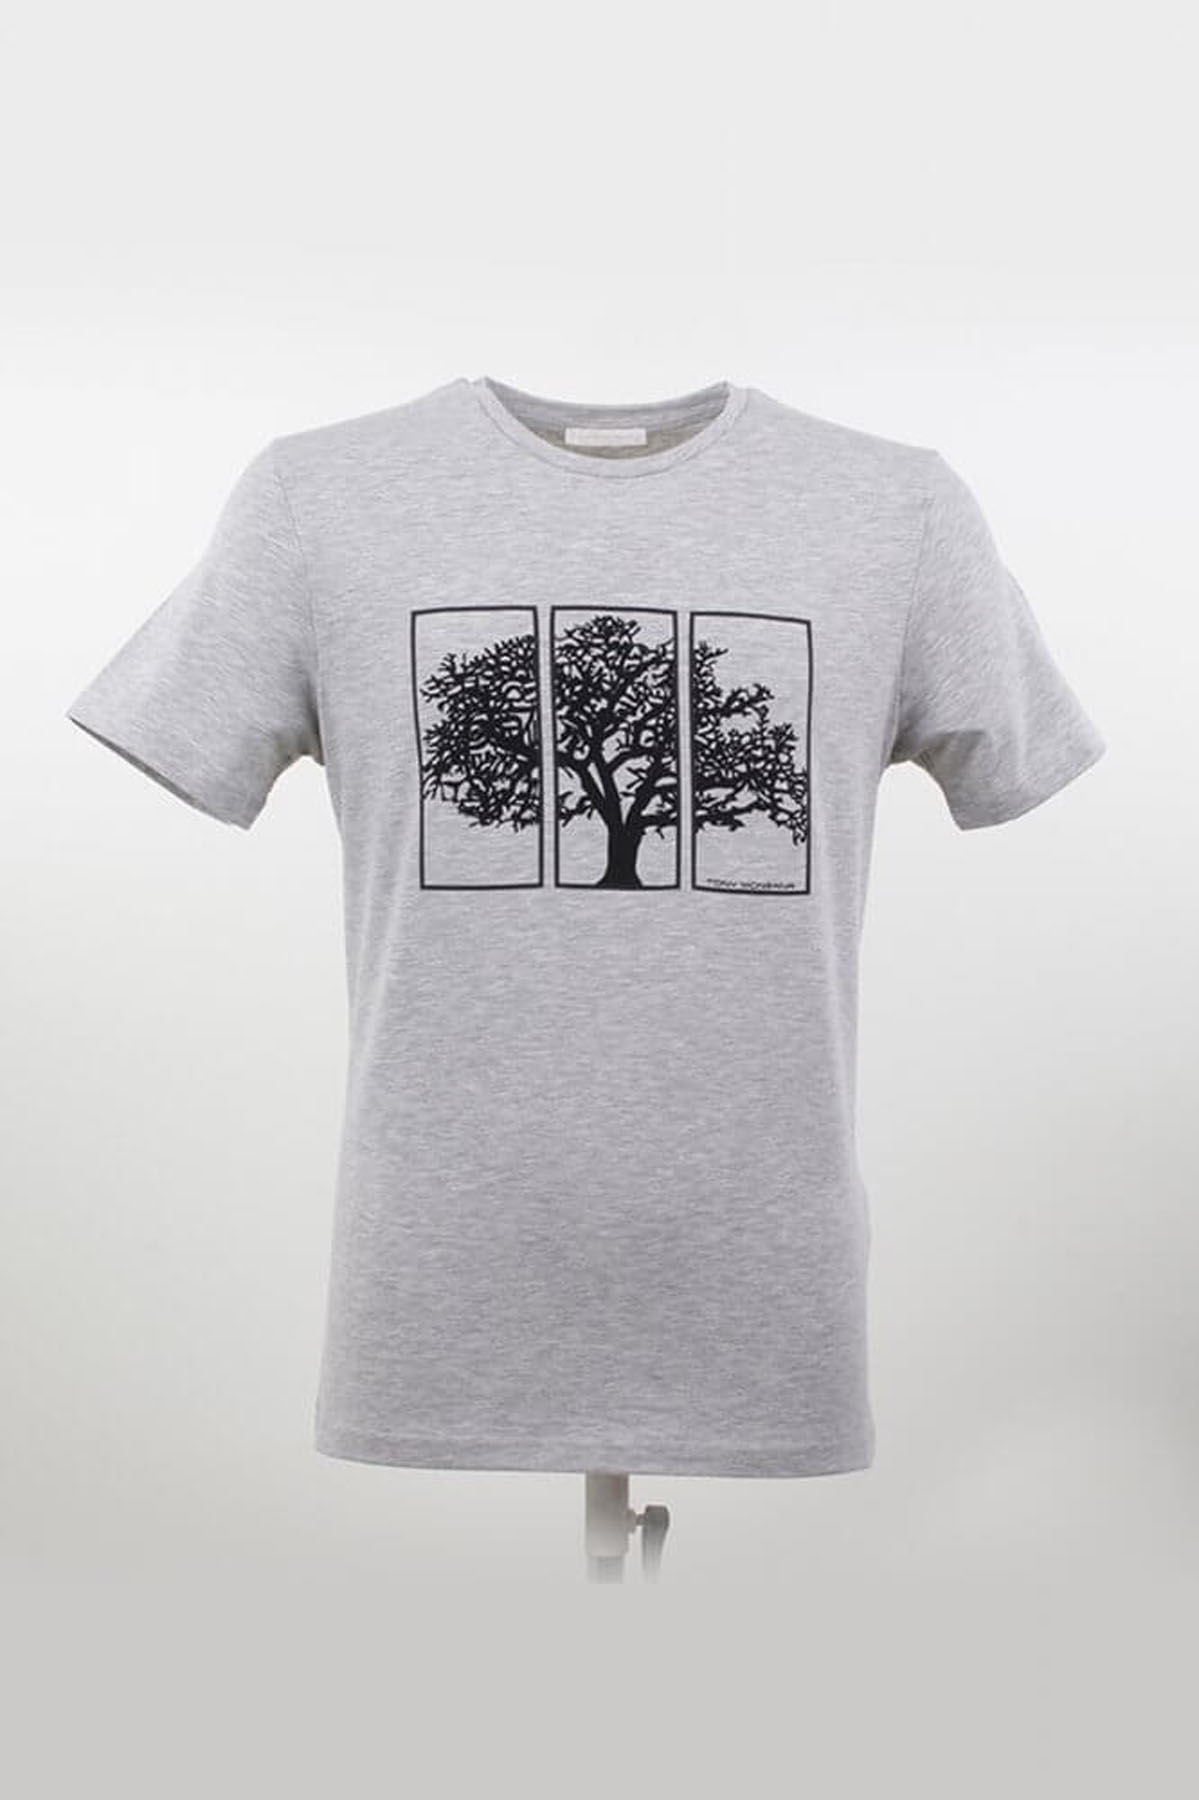 Bisiklet Yaka Ağaç Desenli Grimelanj T-Shirt